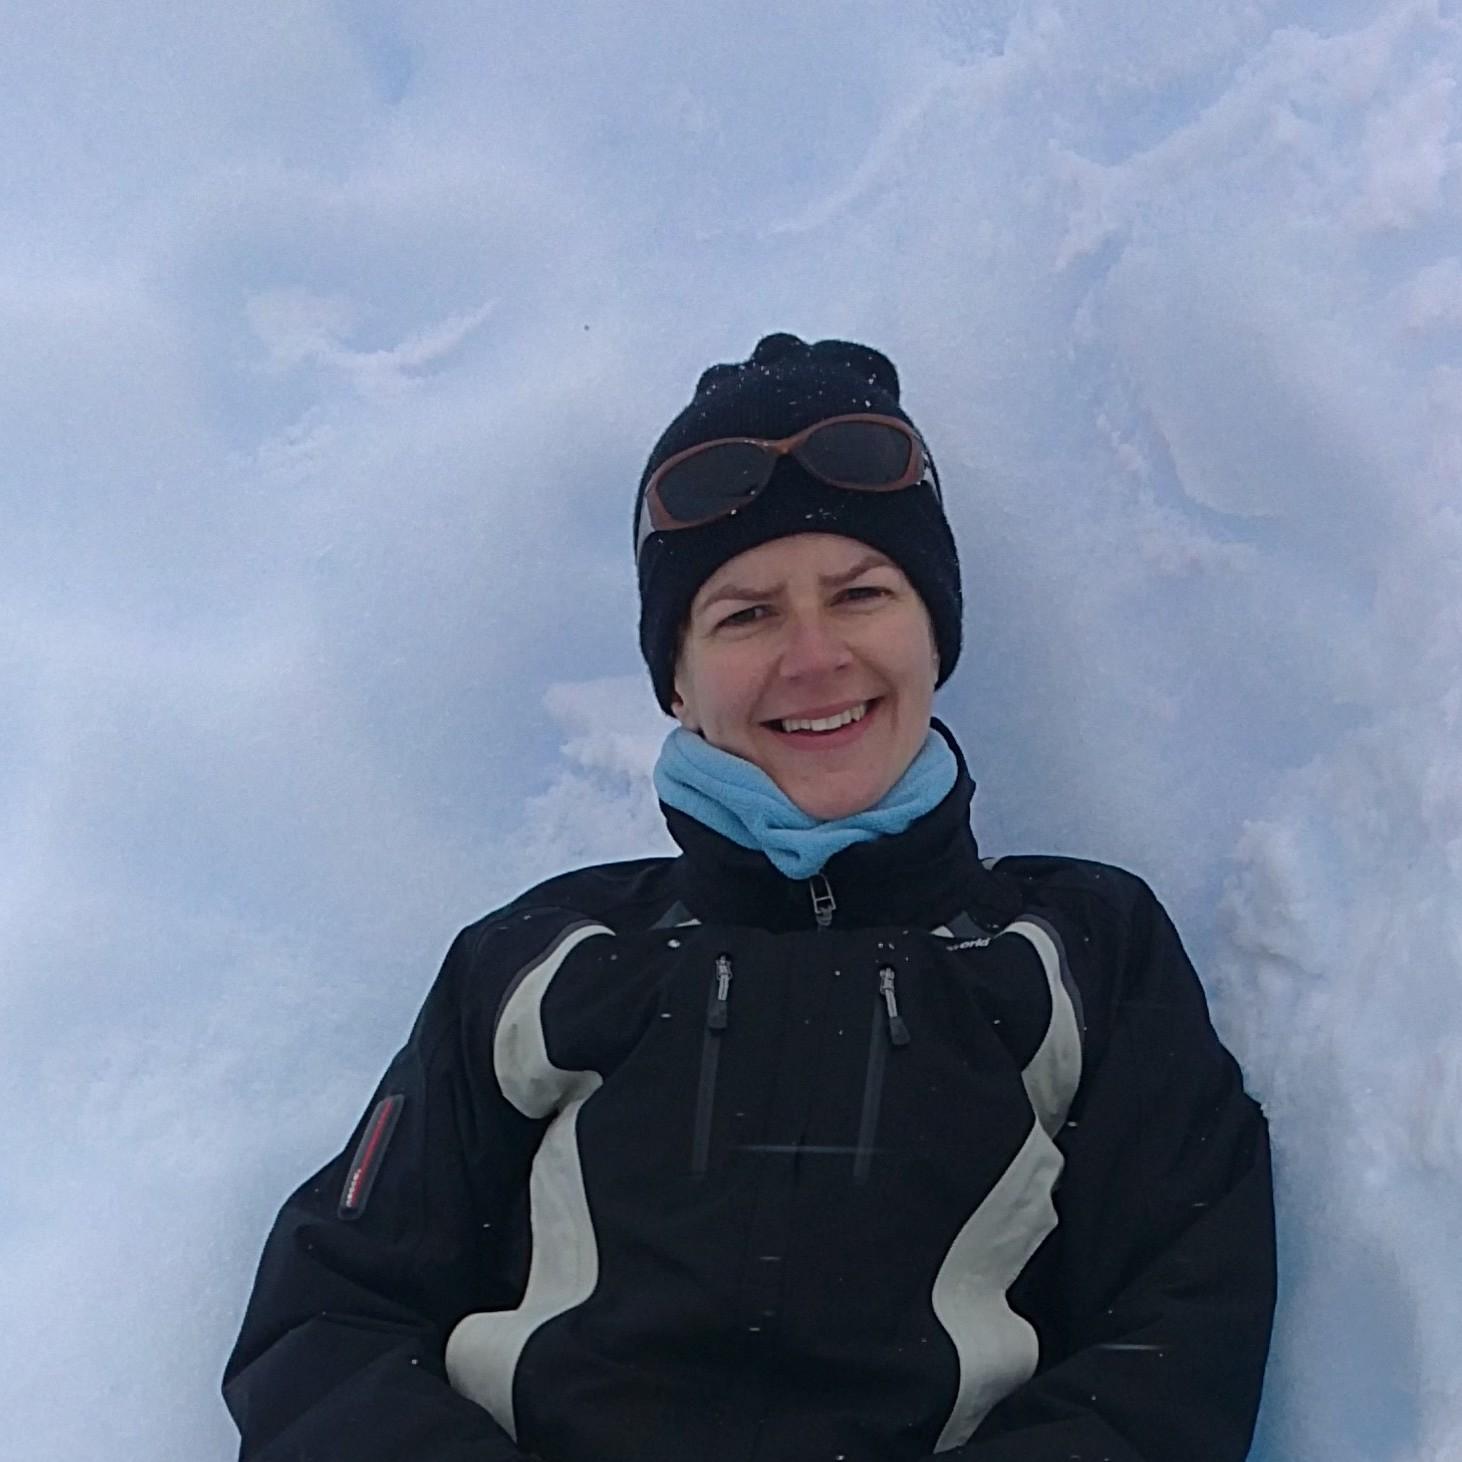 Teresa nieve